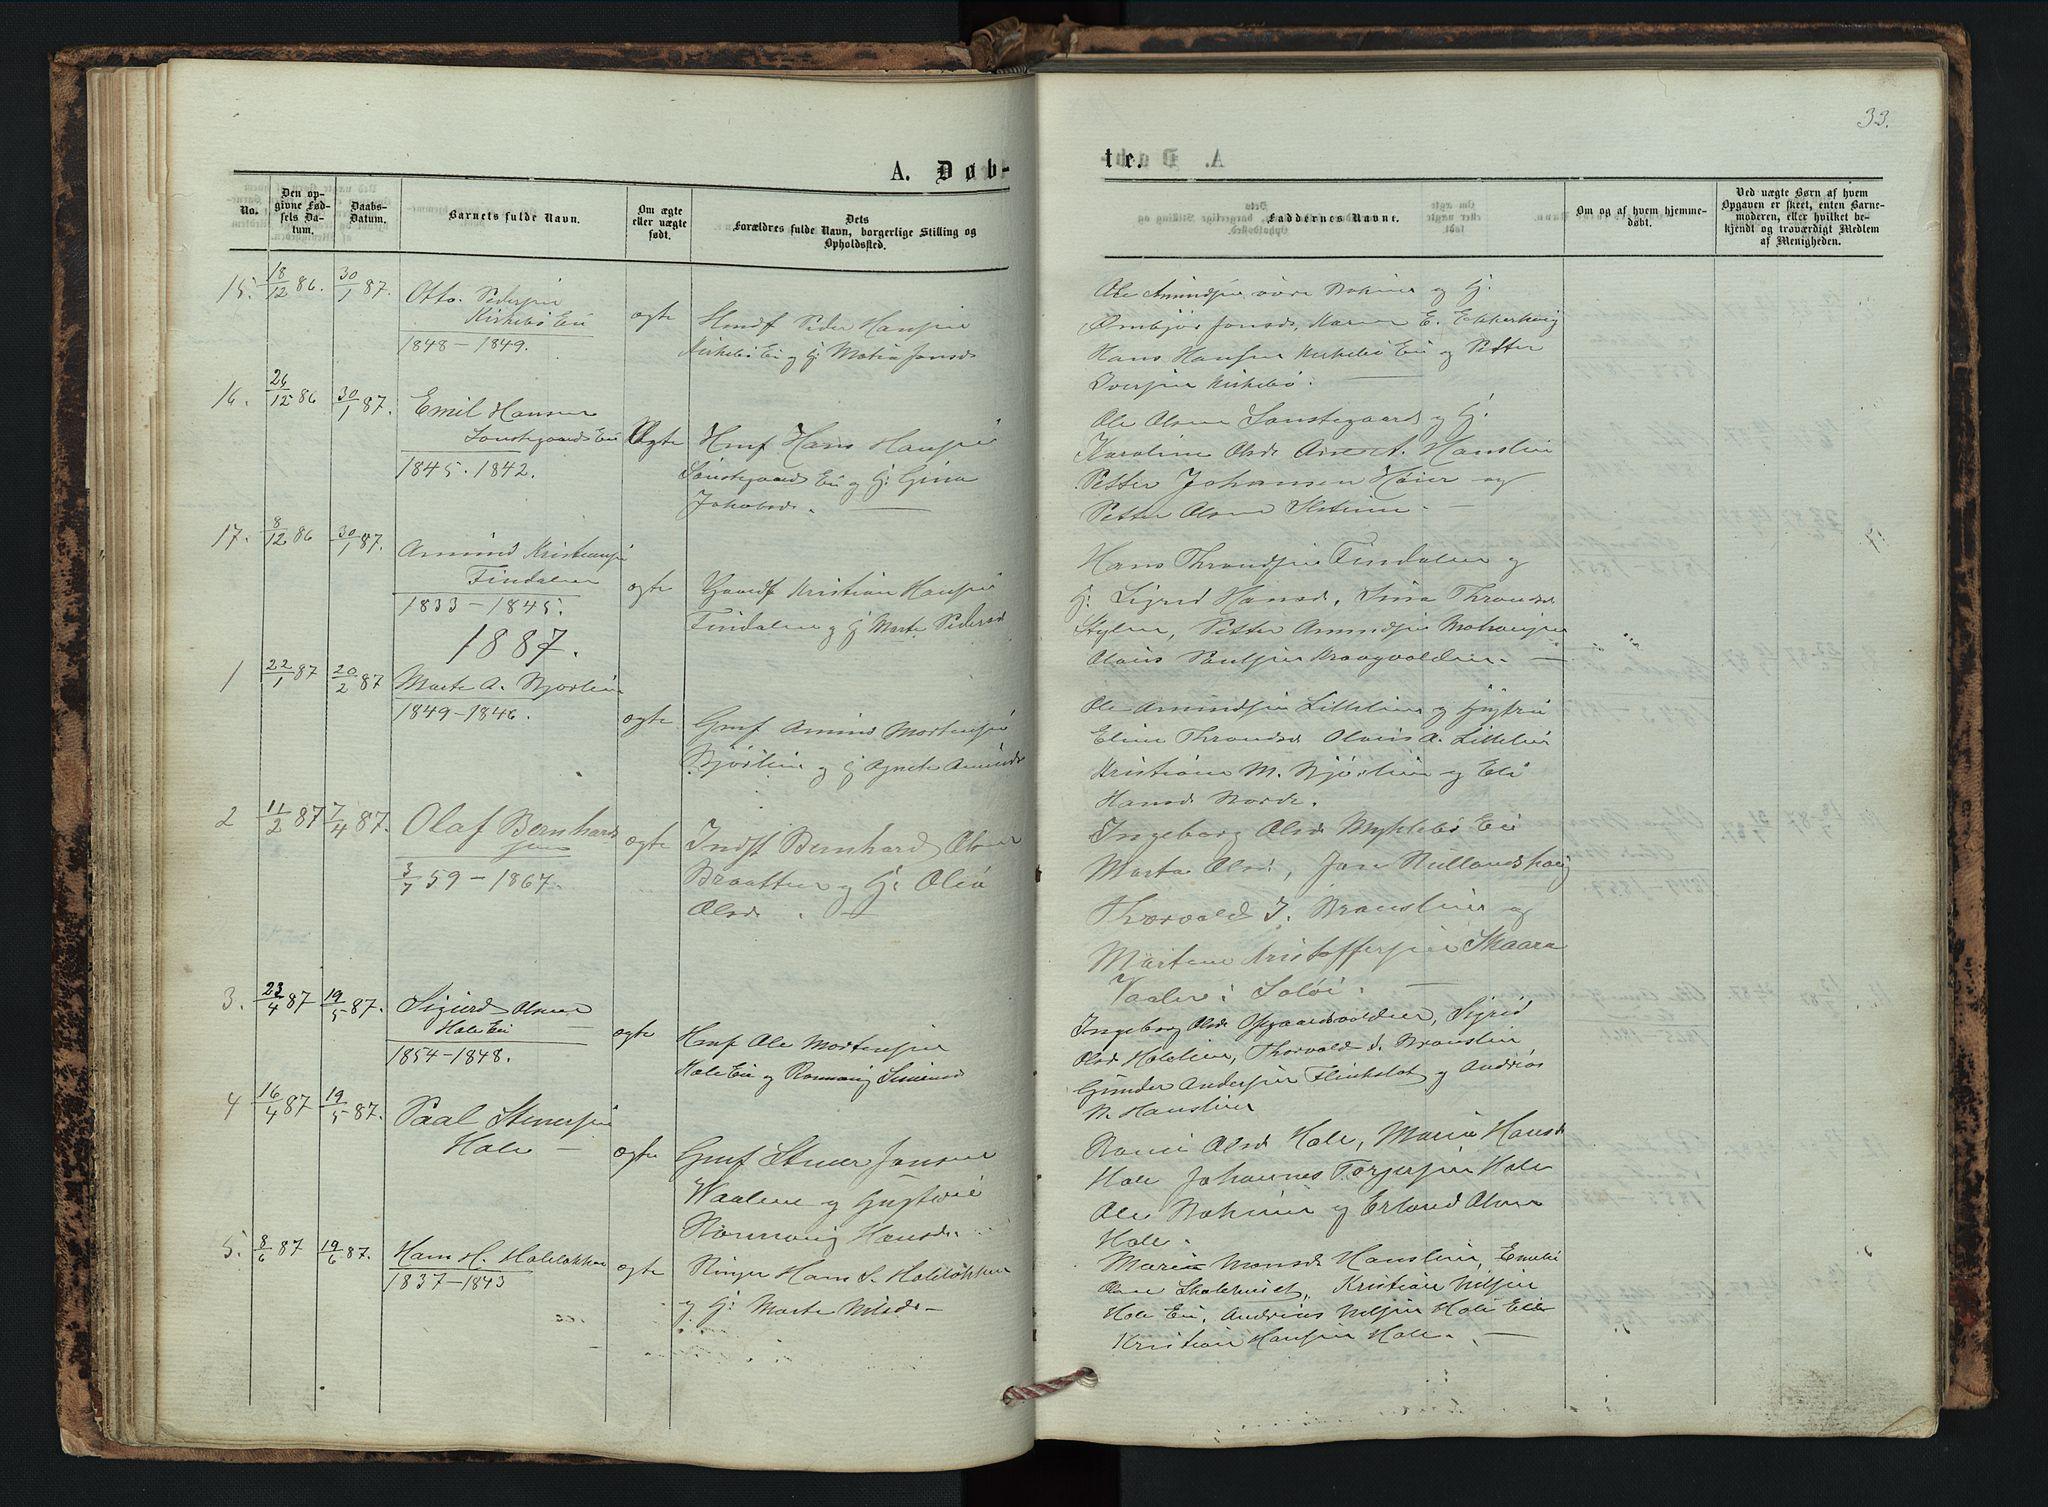 SAH, Vestre Gausdal prestekontor, Klokkerbok nr. 2, 1874-1897, s. 33